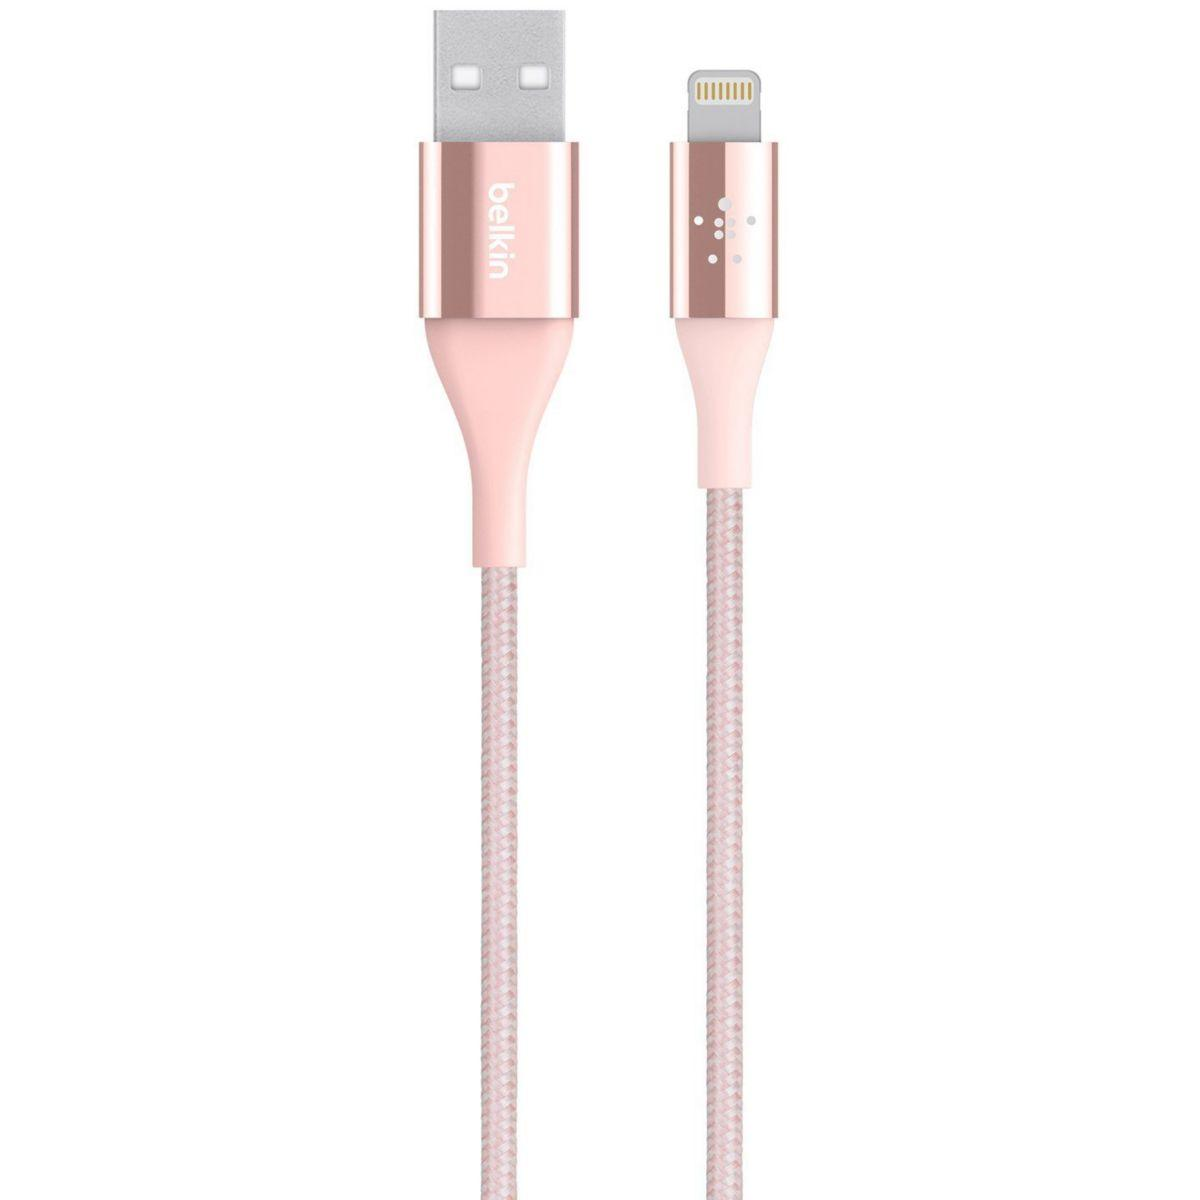 Câble lightning belkin kevlar 1m20 rose - 10% de remise immédiate avec le code : multi10 (photo)